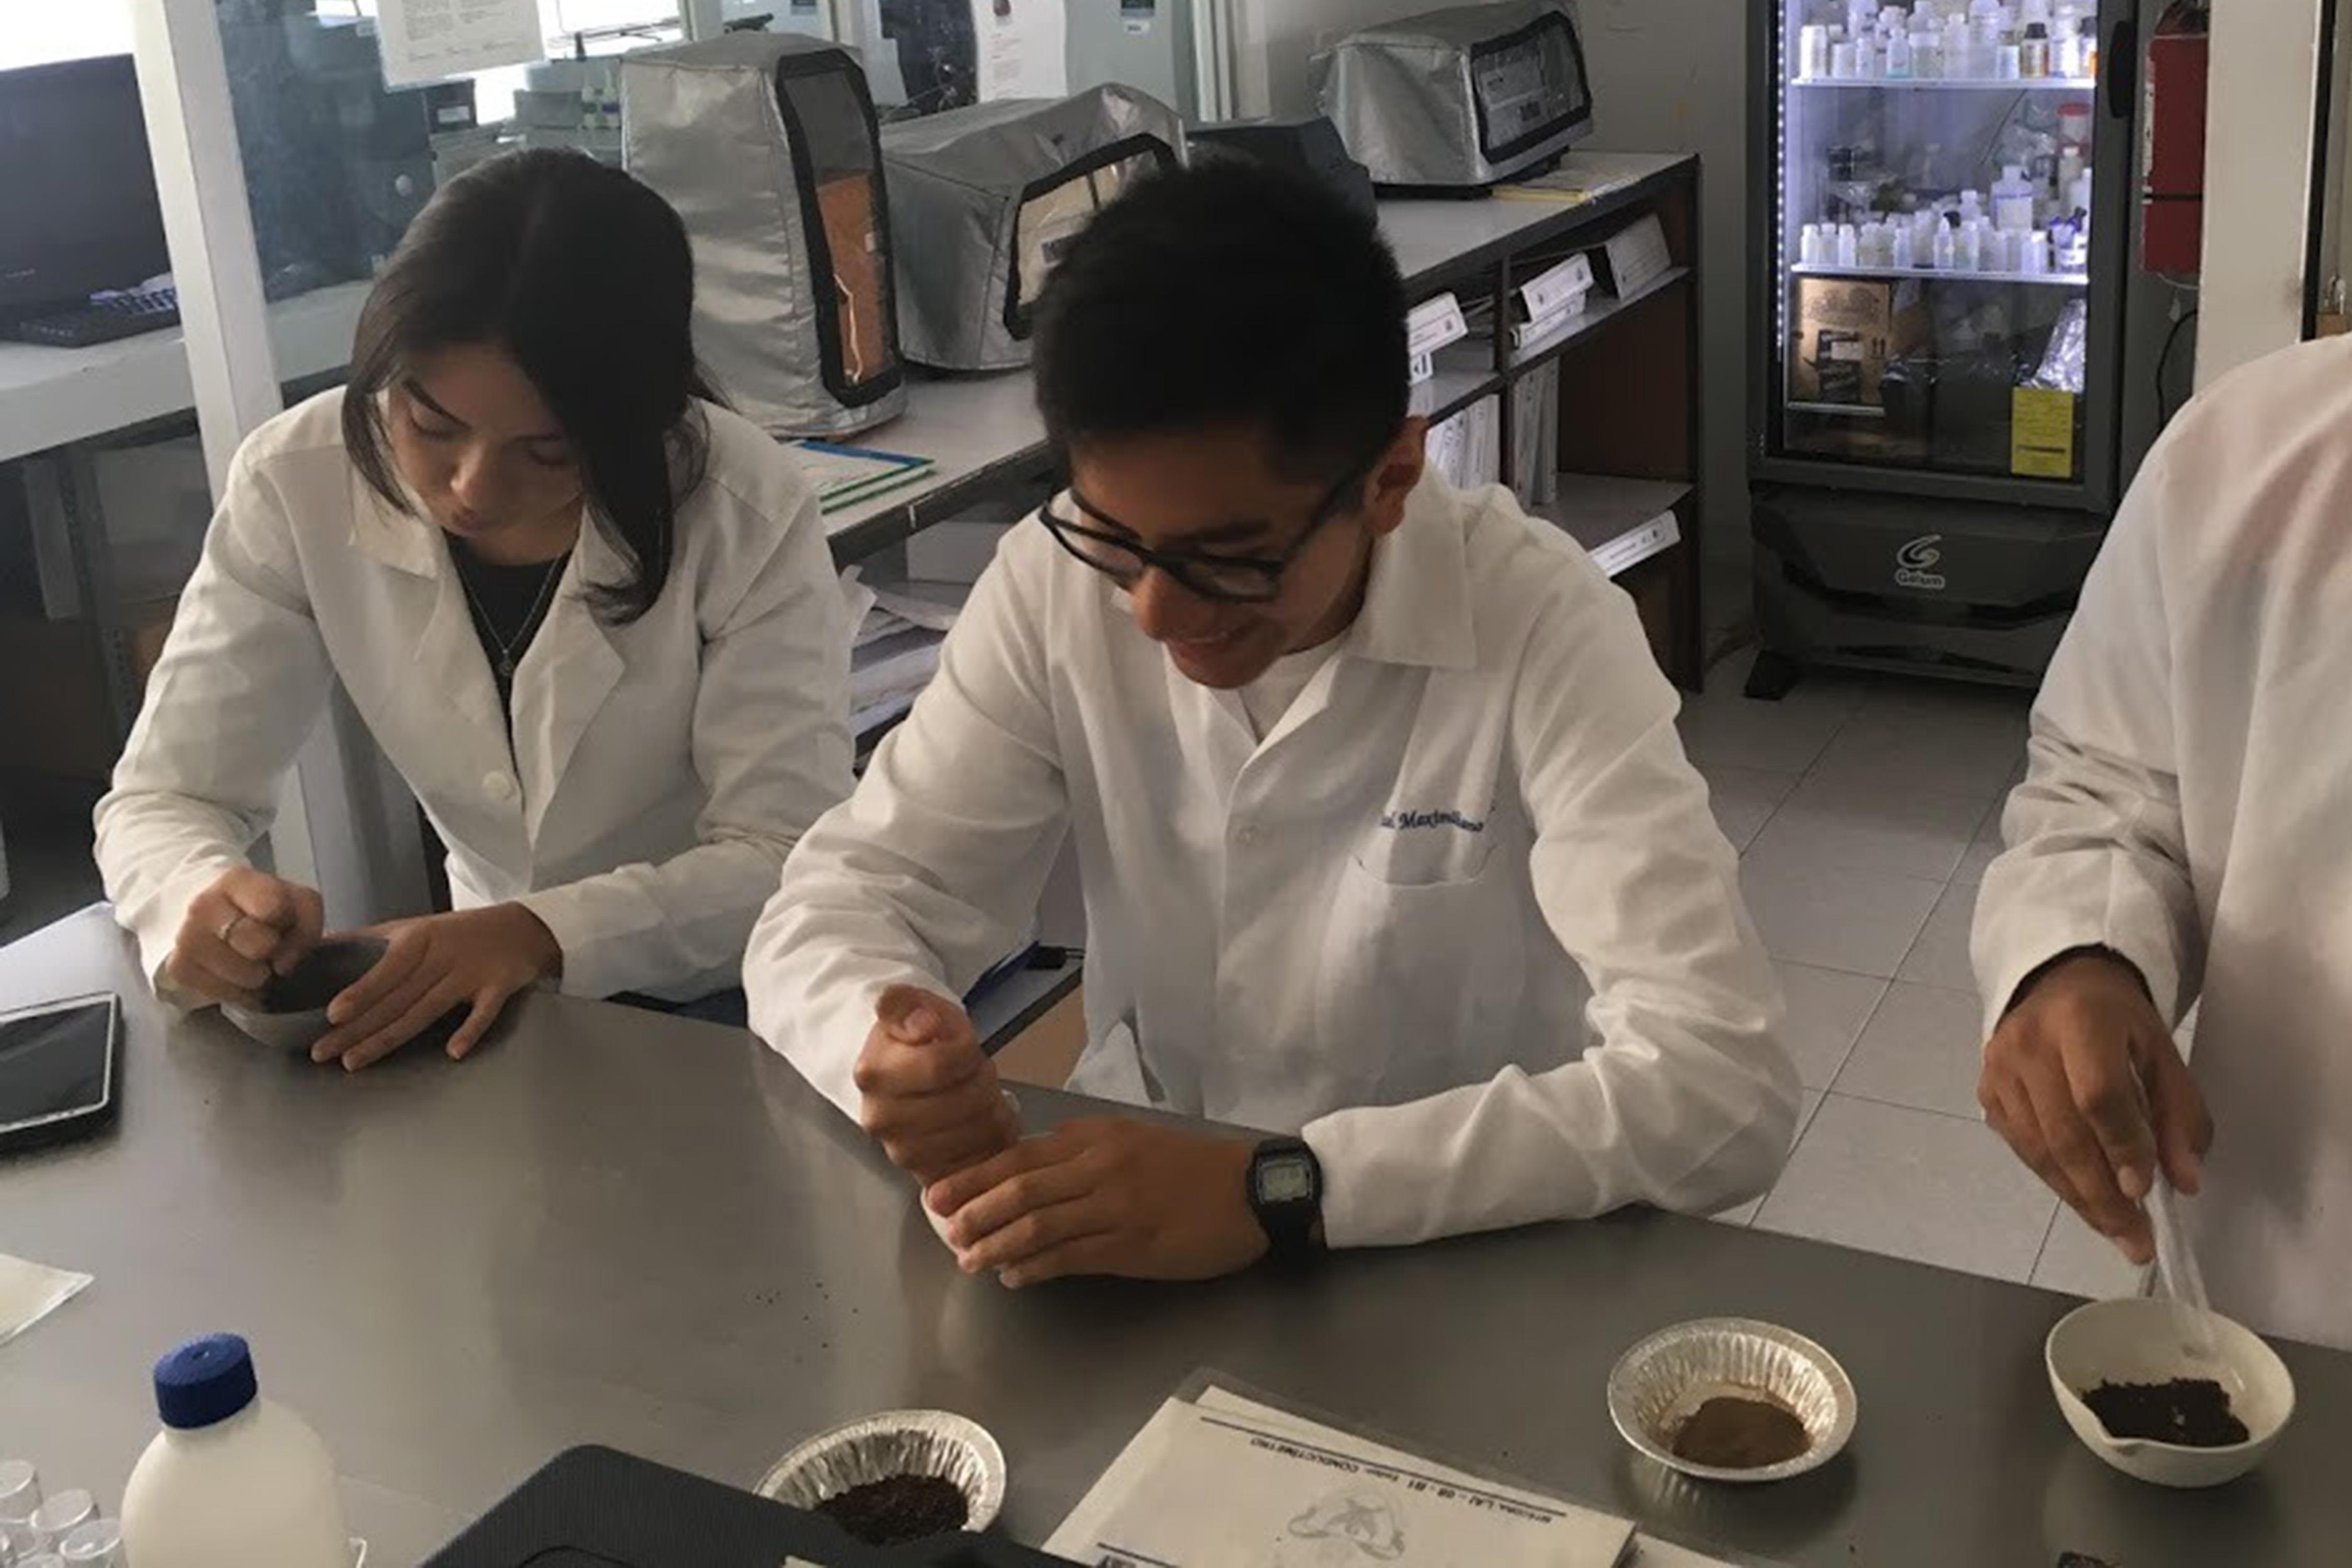 FIQ-BUAP obtiene biopolímero a partir de aloe vera para generar bioplástico